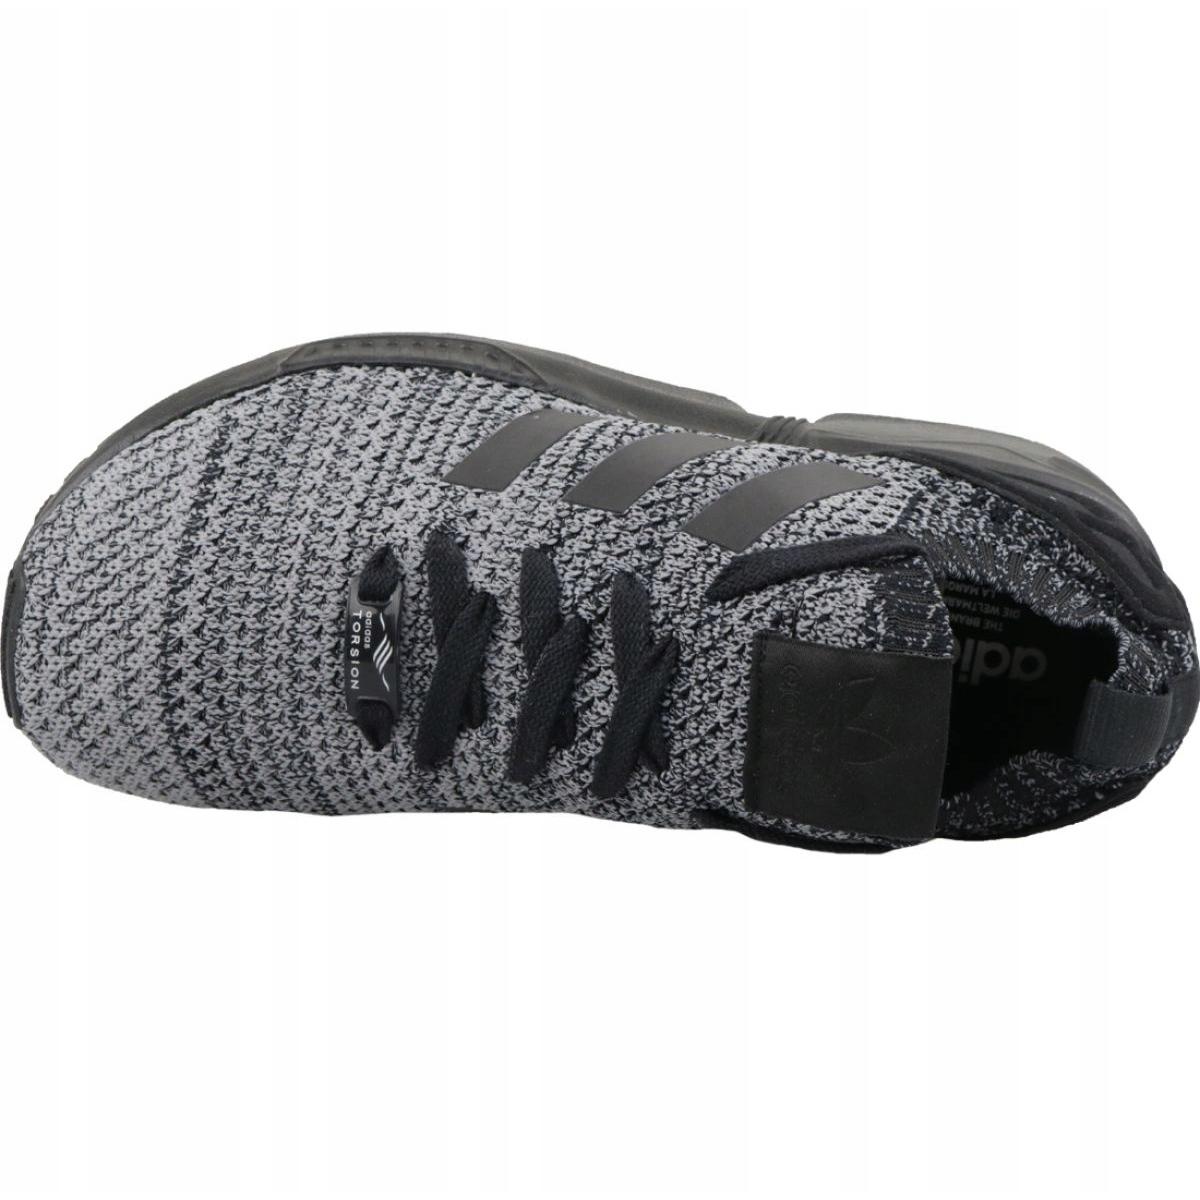 brand new ee5f0 a1aab Black Adidas Originals Zx Flux Primeknit M BZ0562 shoes